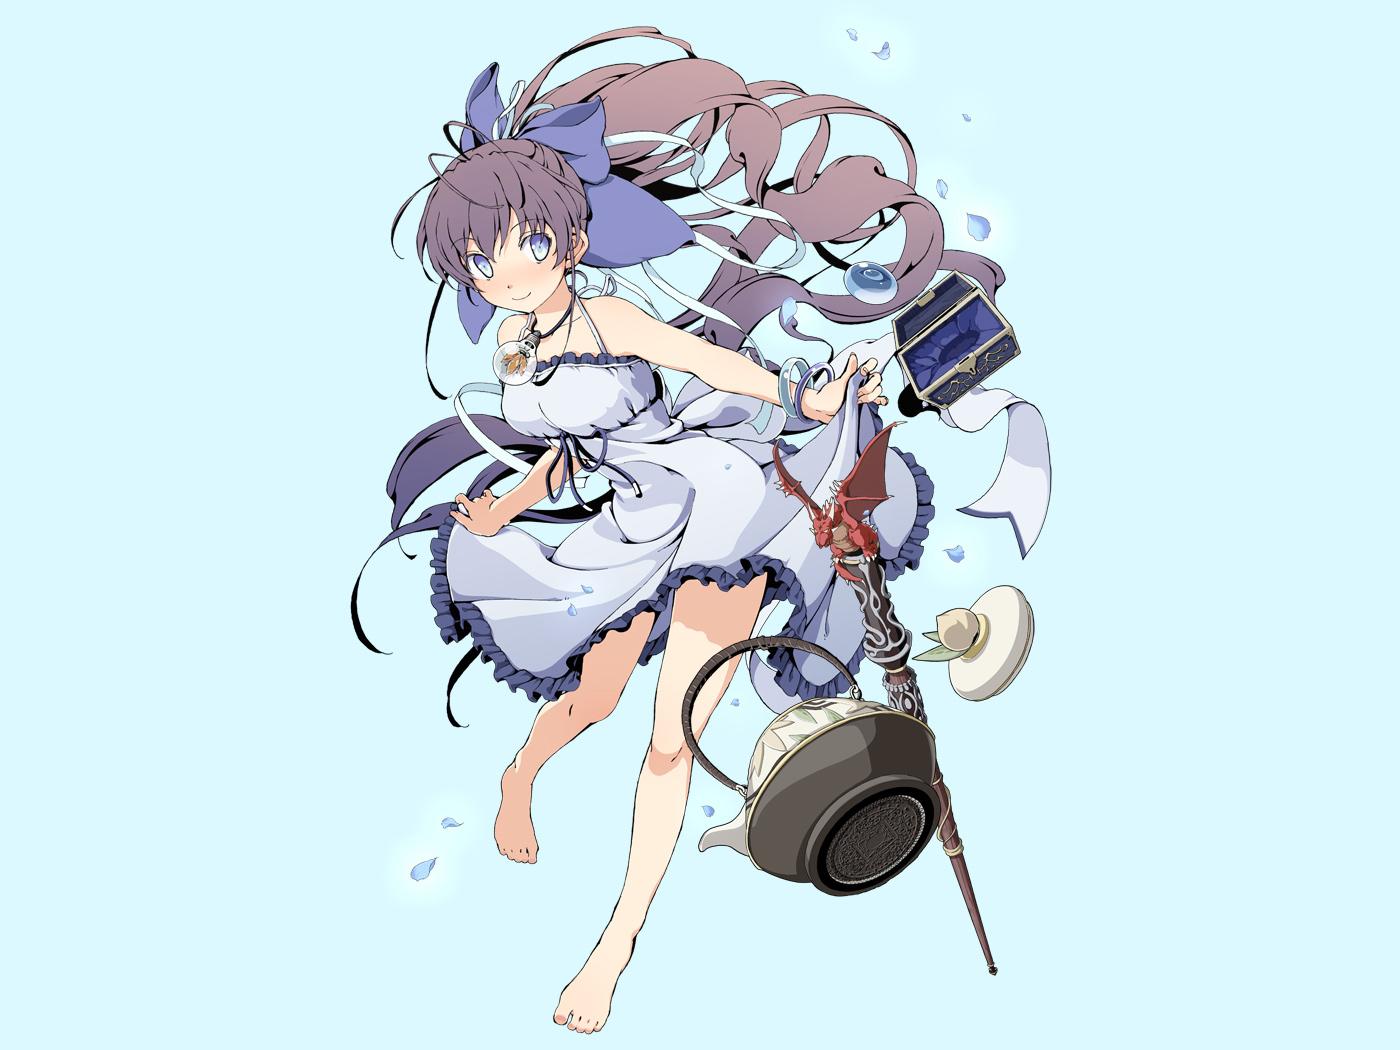 azuma_syoujuan barefoot blue dress long_hair ryuugajou_nanana ryuugajou_nanana_no_maizoukin